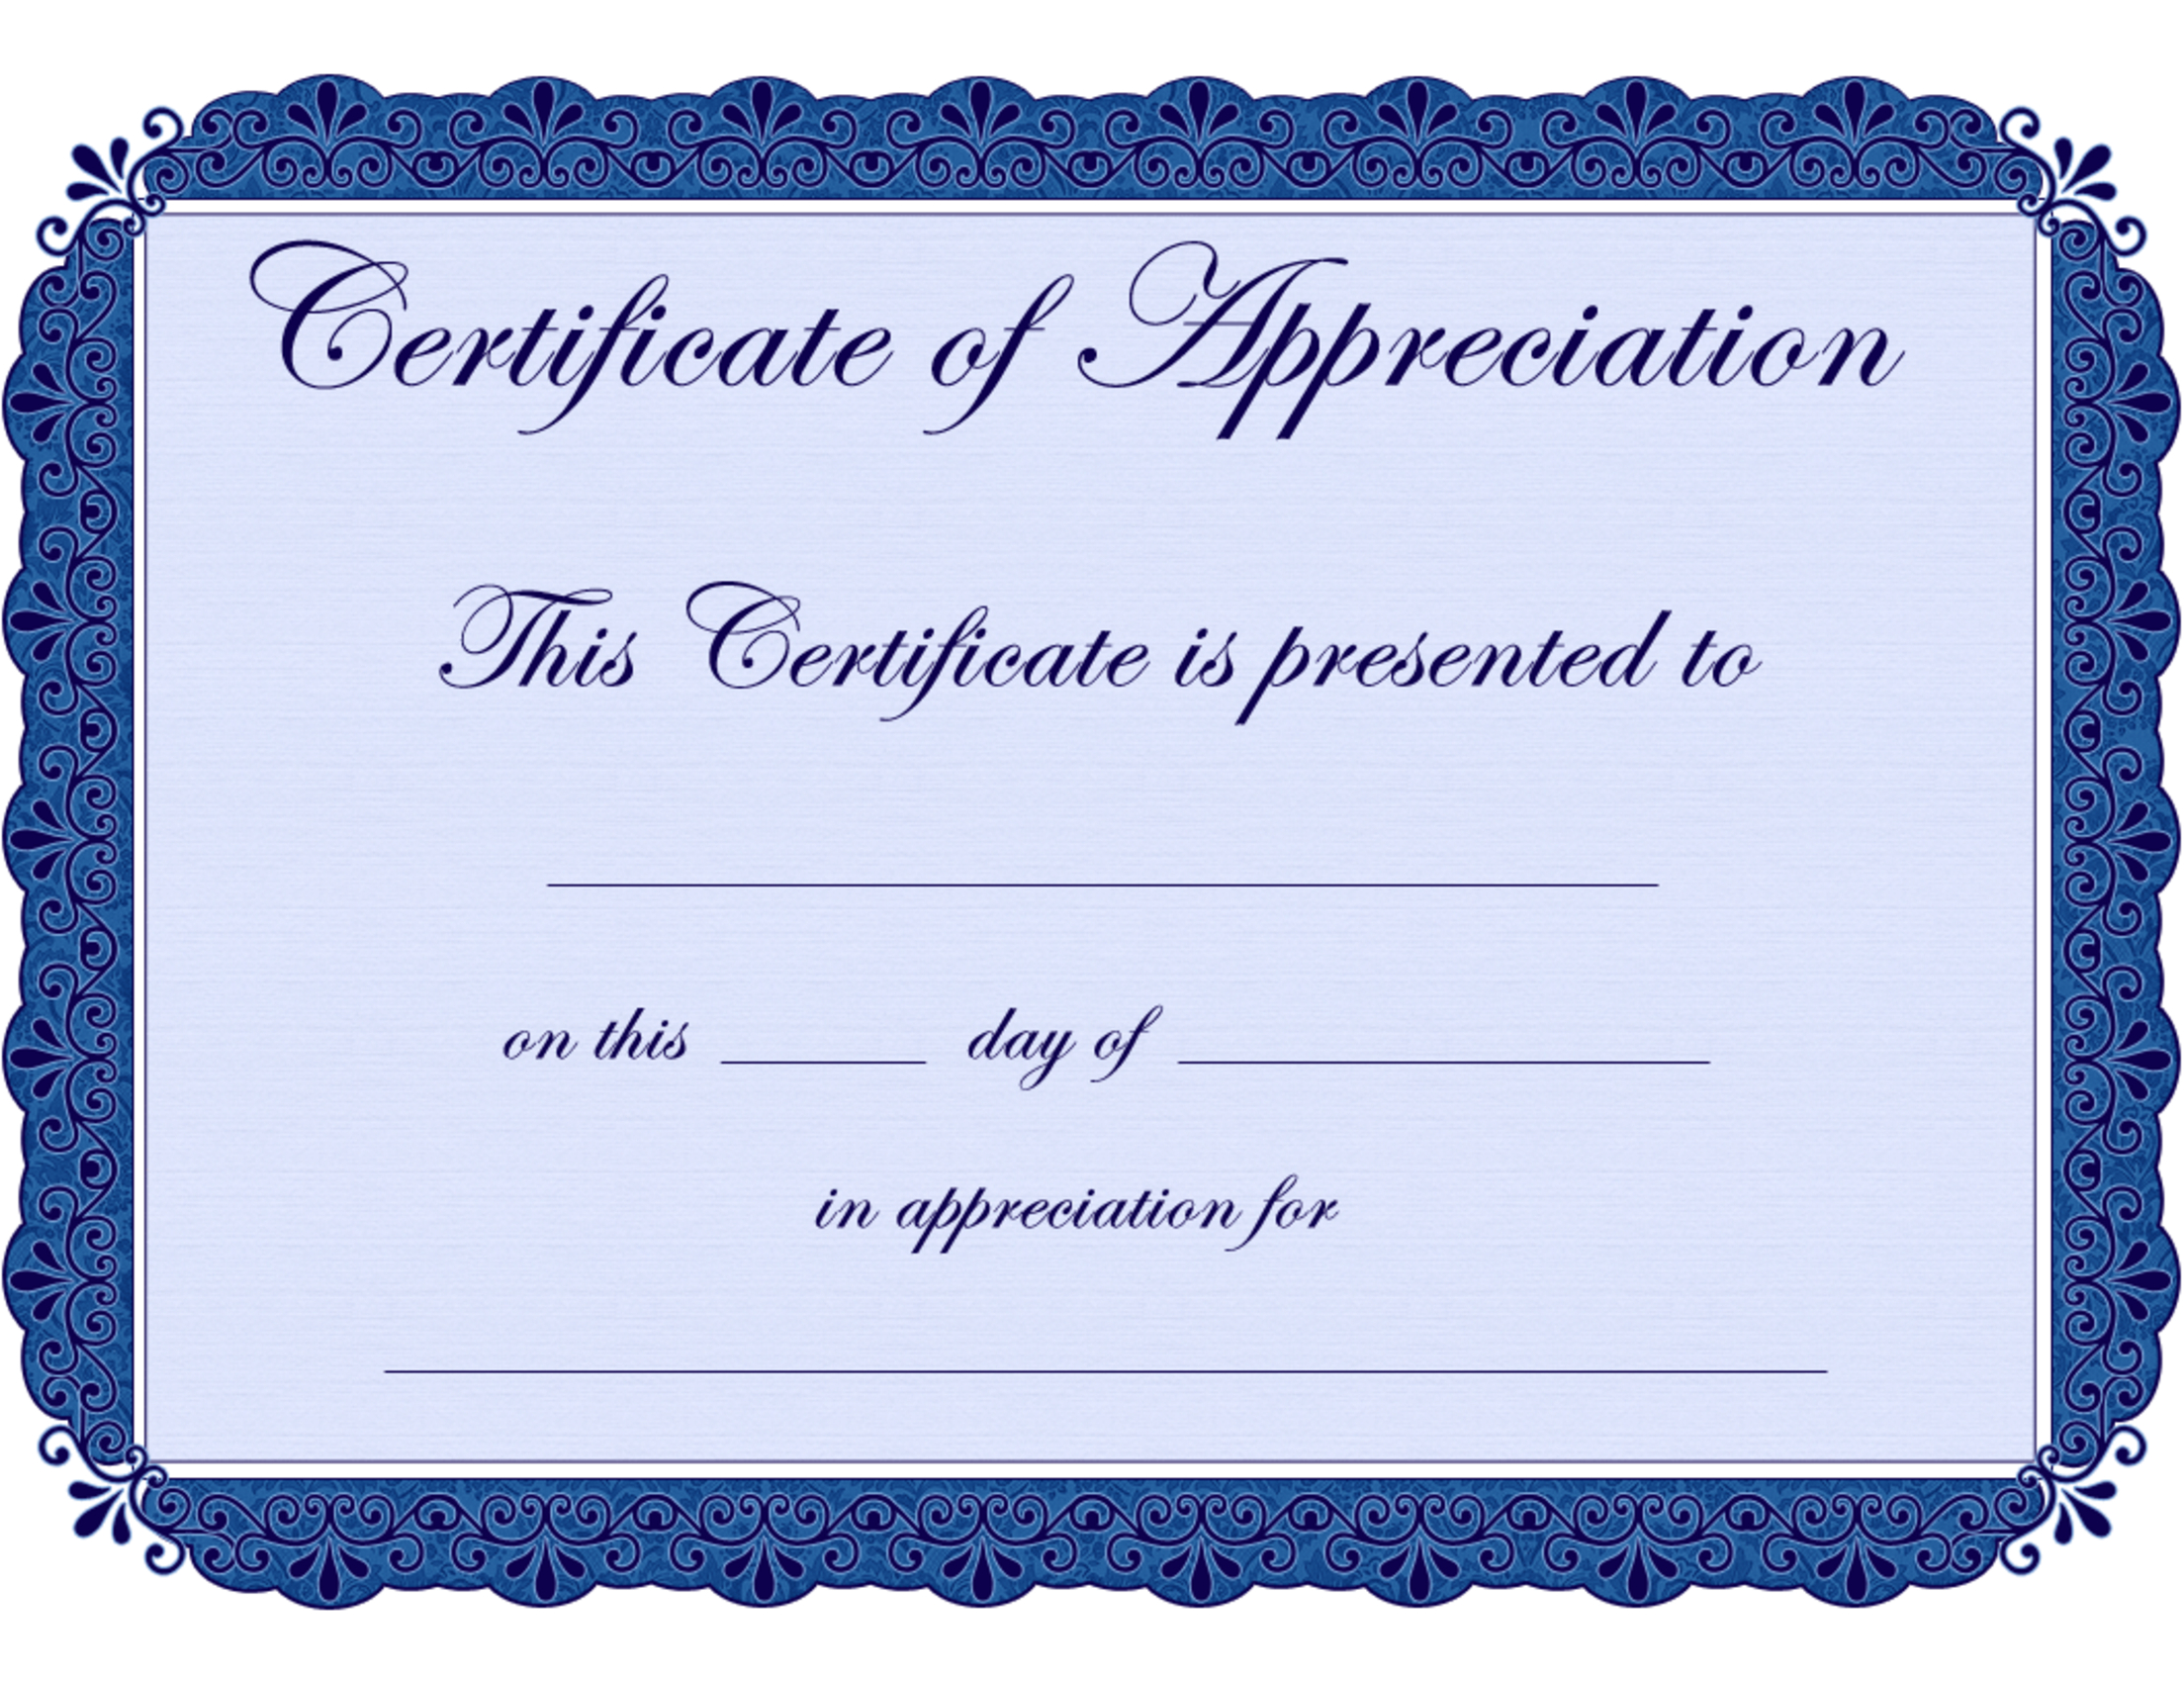 Free Printable Certificates Certificate Of Appreciation Certificate - Free Printable Diploma Template